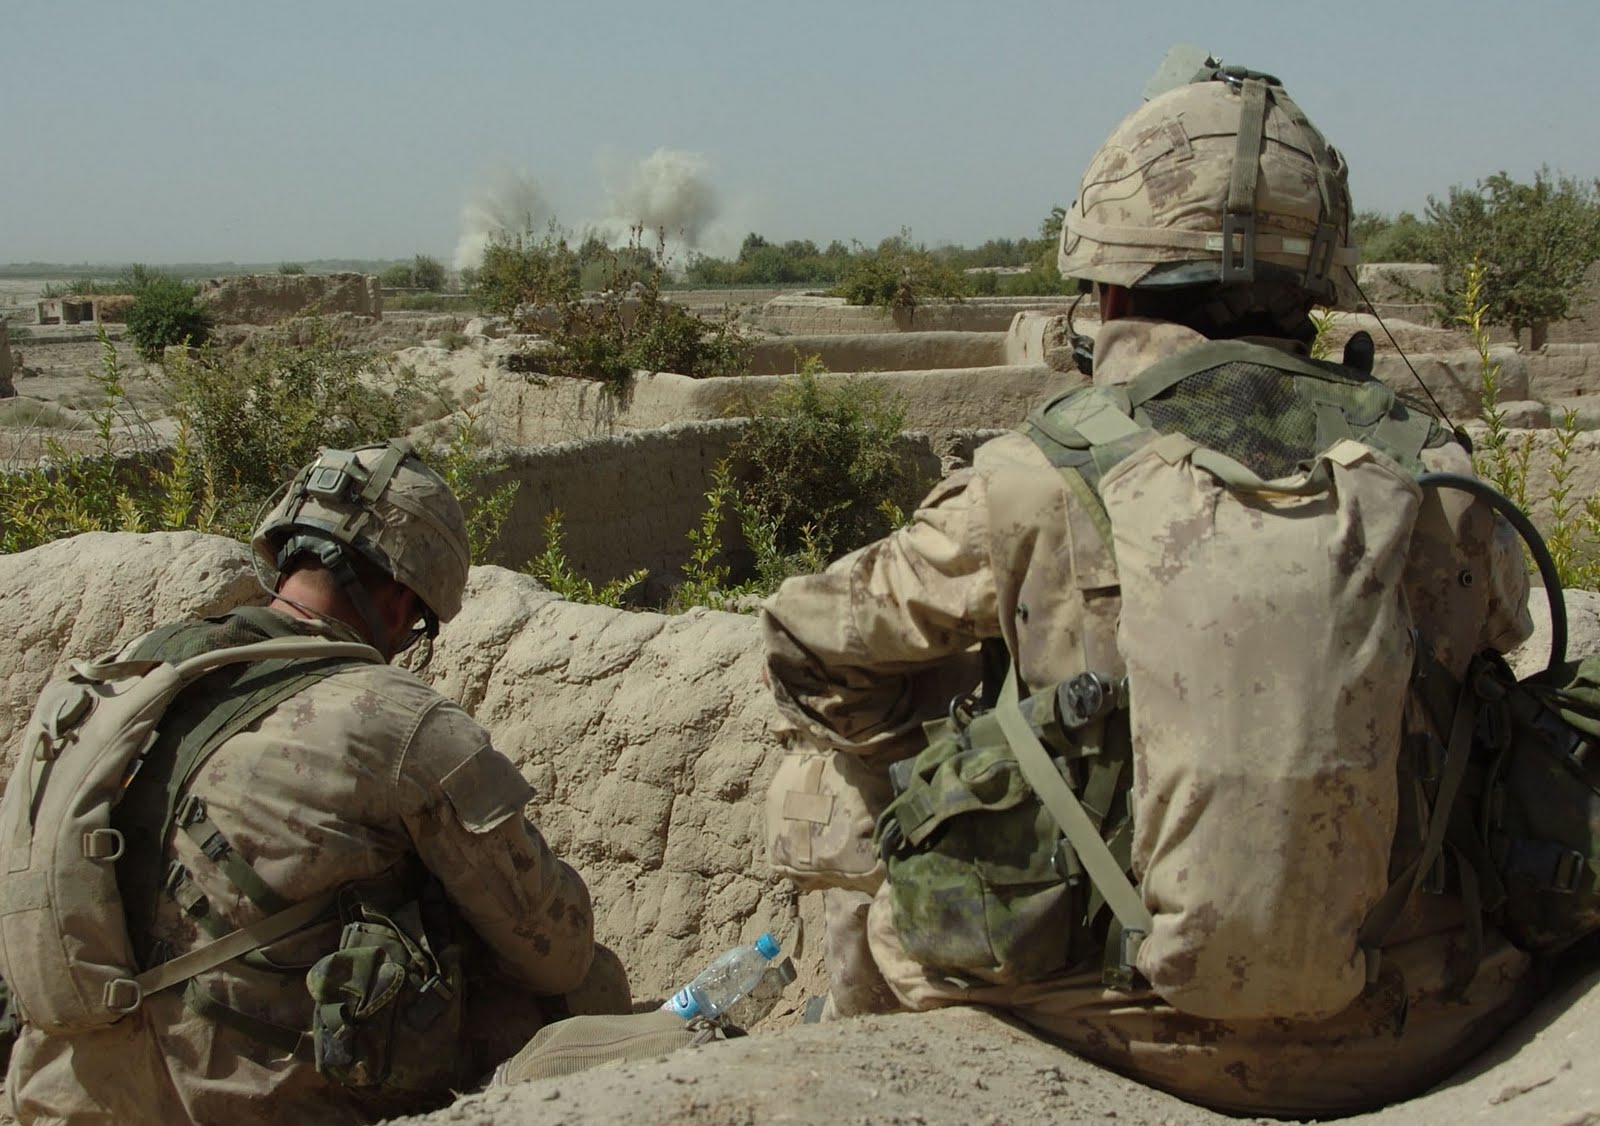 http://3.bp.blogspot.com/_7g7vq7oz8bE/THwns2QlHuI/AAAAAAAAEBw/7mfjMokz8W0/s1600/Canadian_soldiers_during_Operation_Medusa.jpg